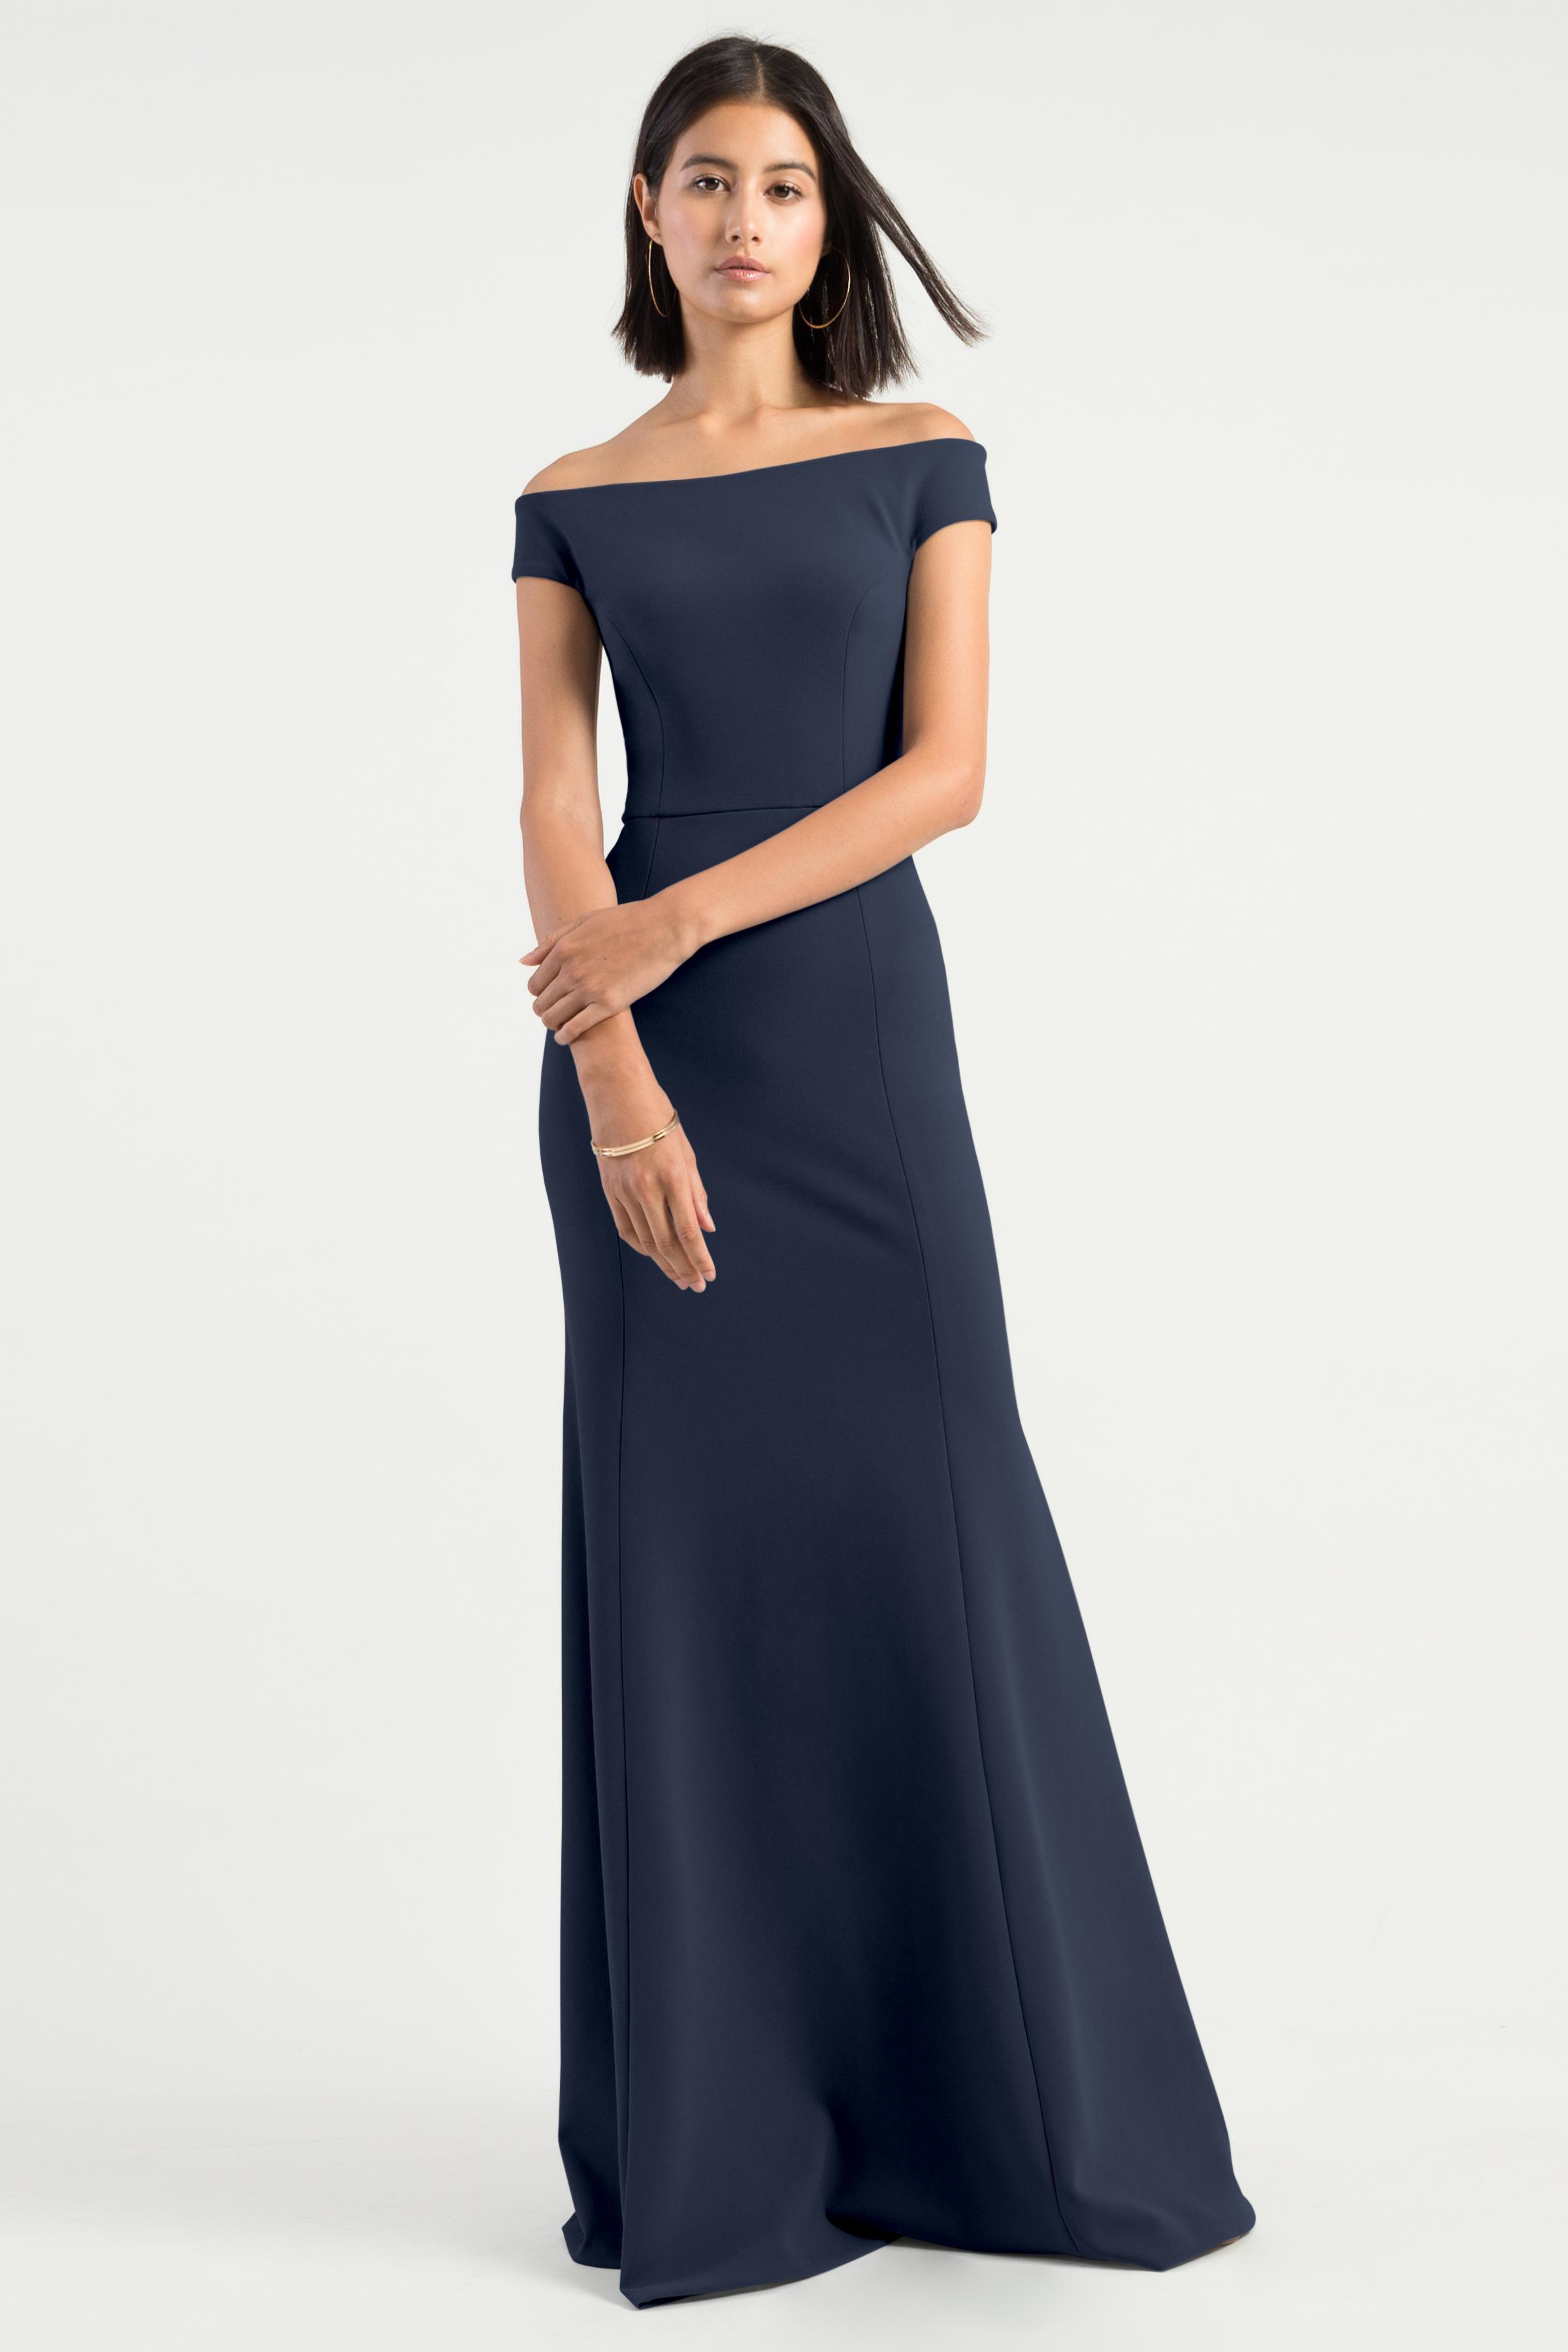 Larson Bridesmaids Dress by Jenny Yoo - Midnight